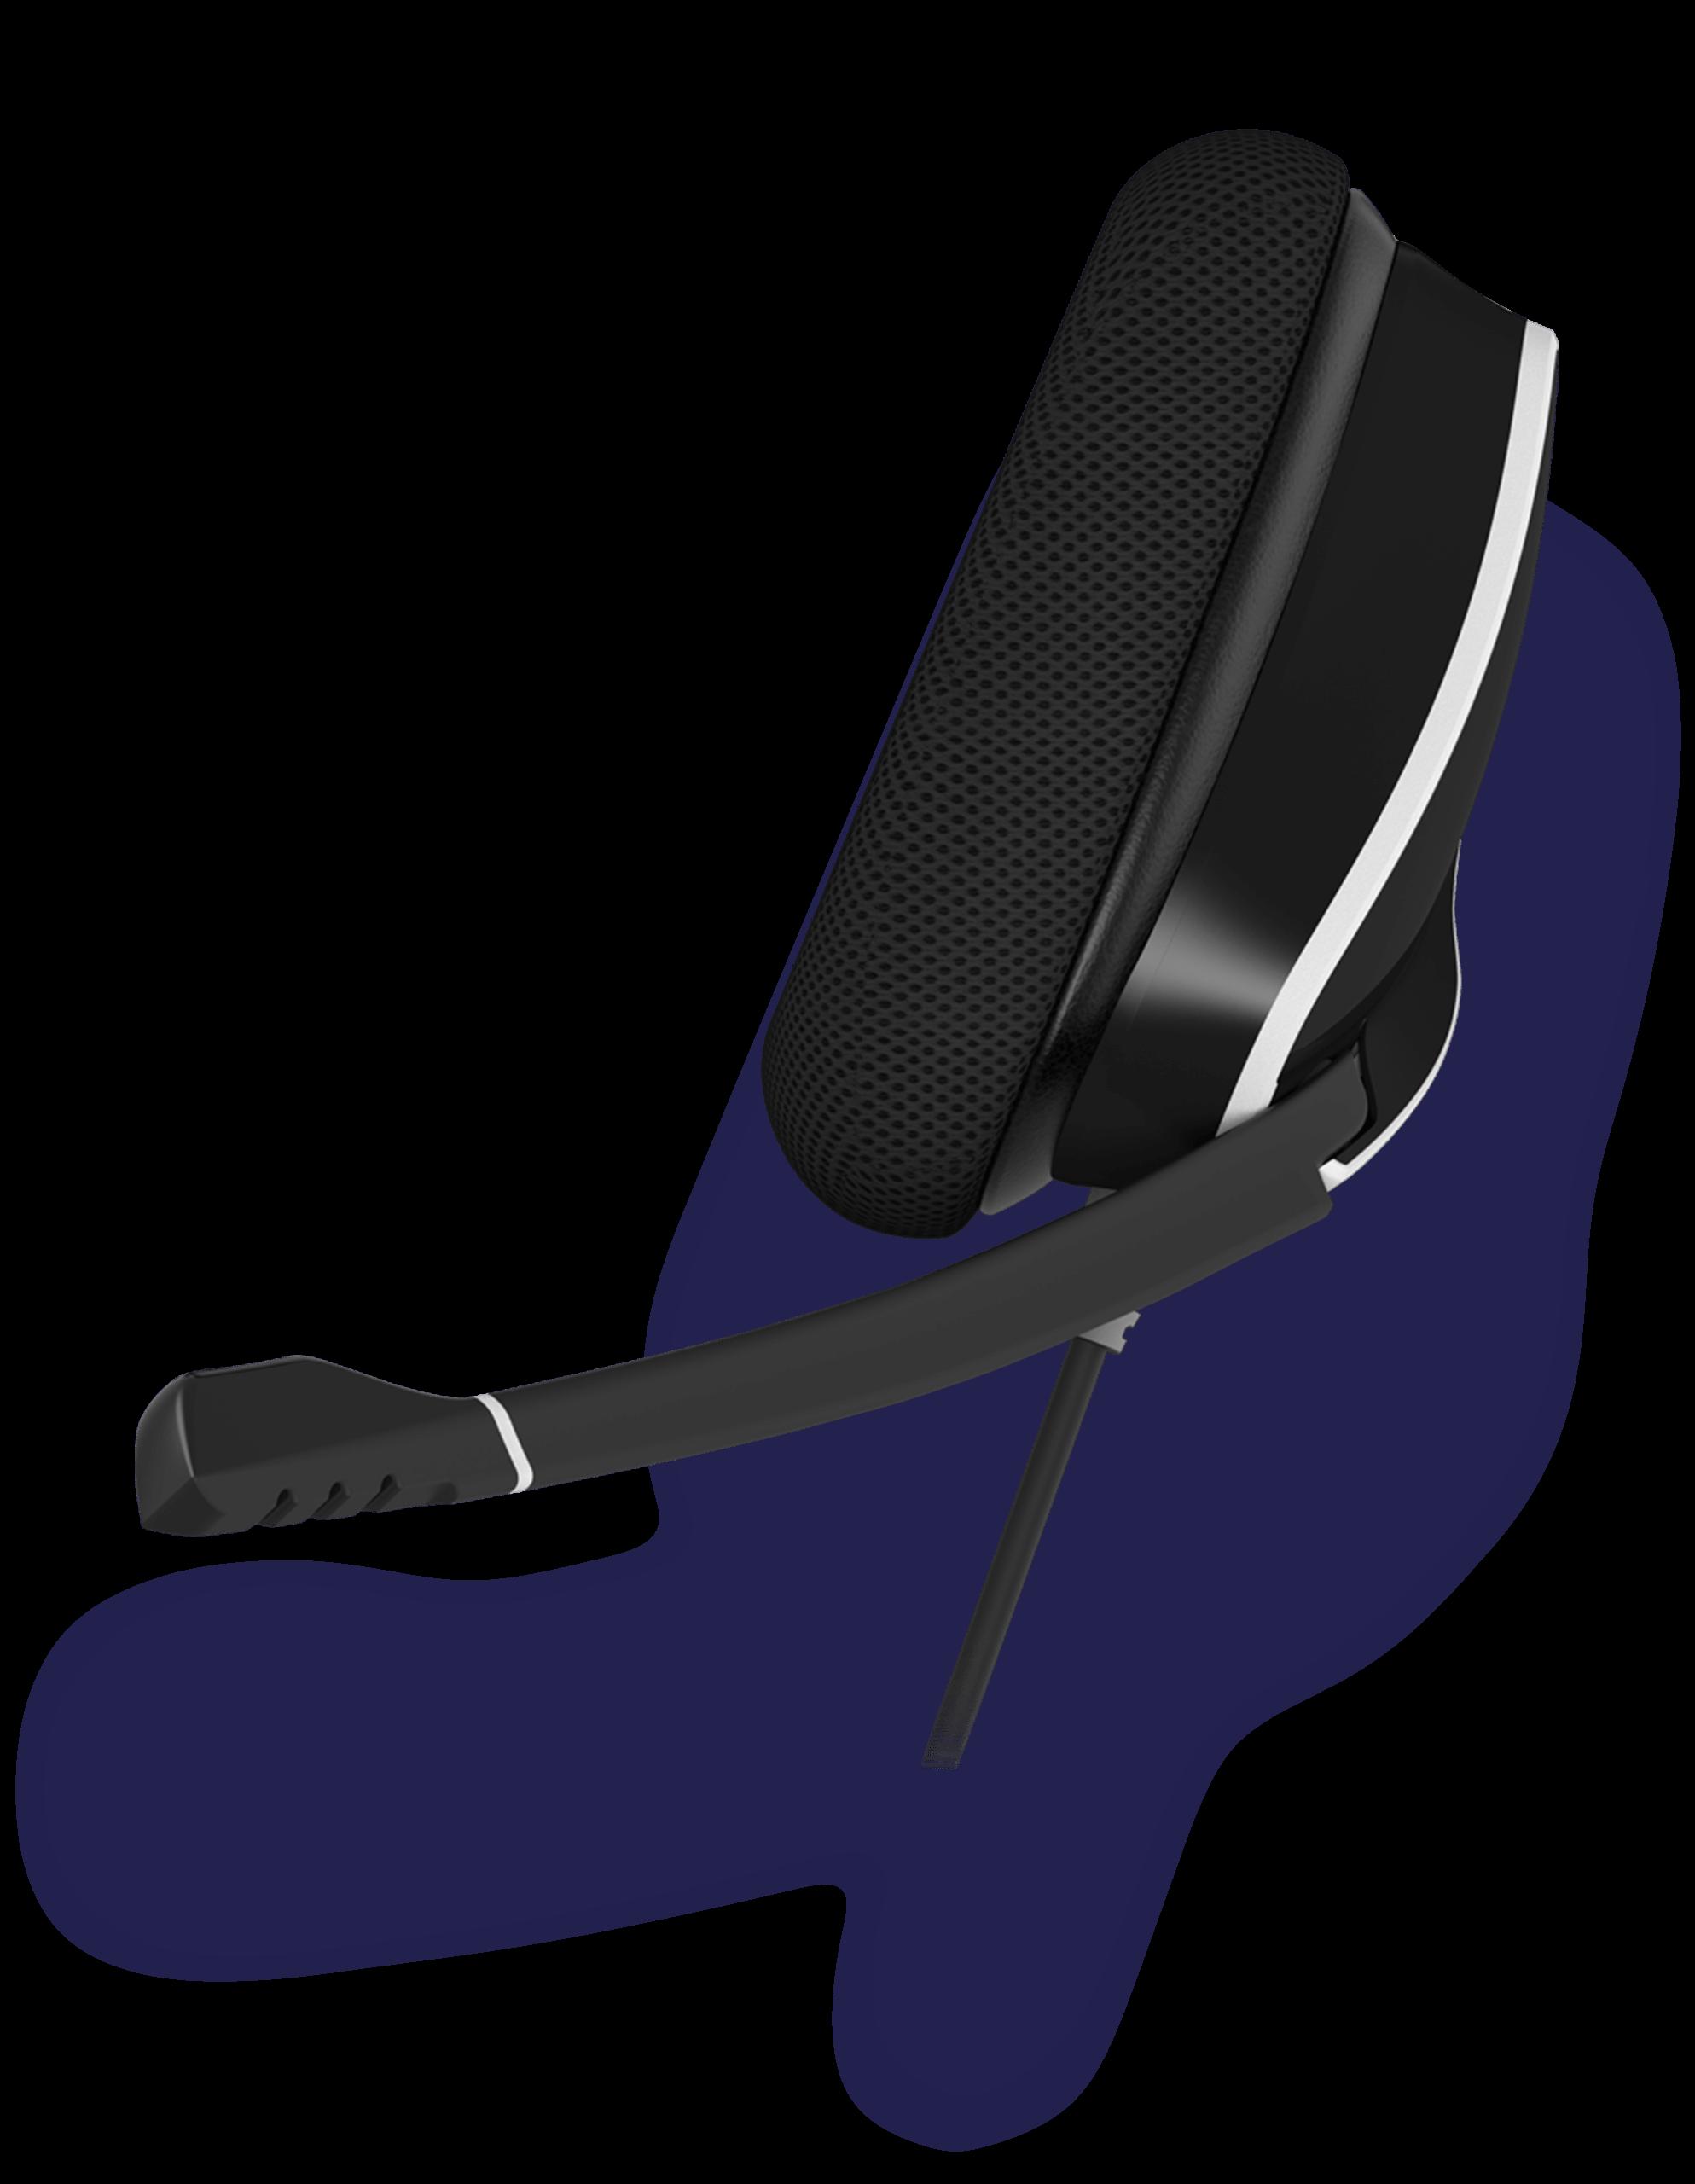 Corsair VOID RGB ELITE USB Premium Gaming Headset with 7.1 Surround Sound — Carbon 22